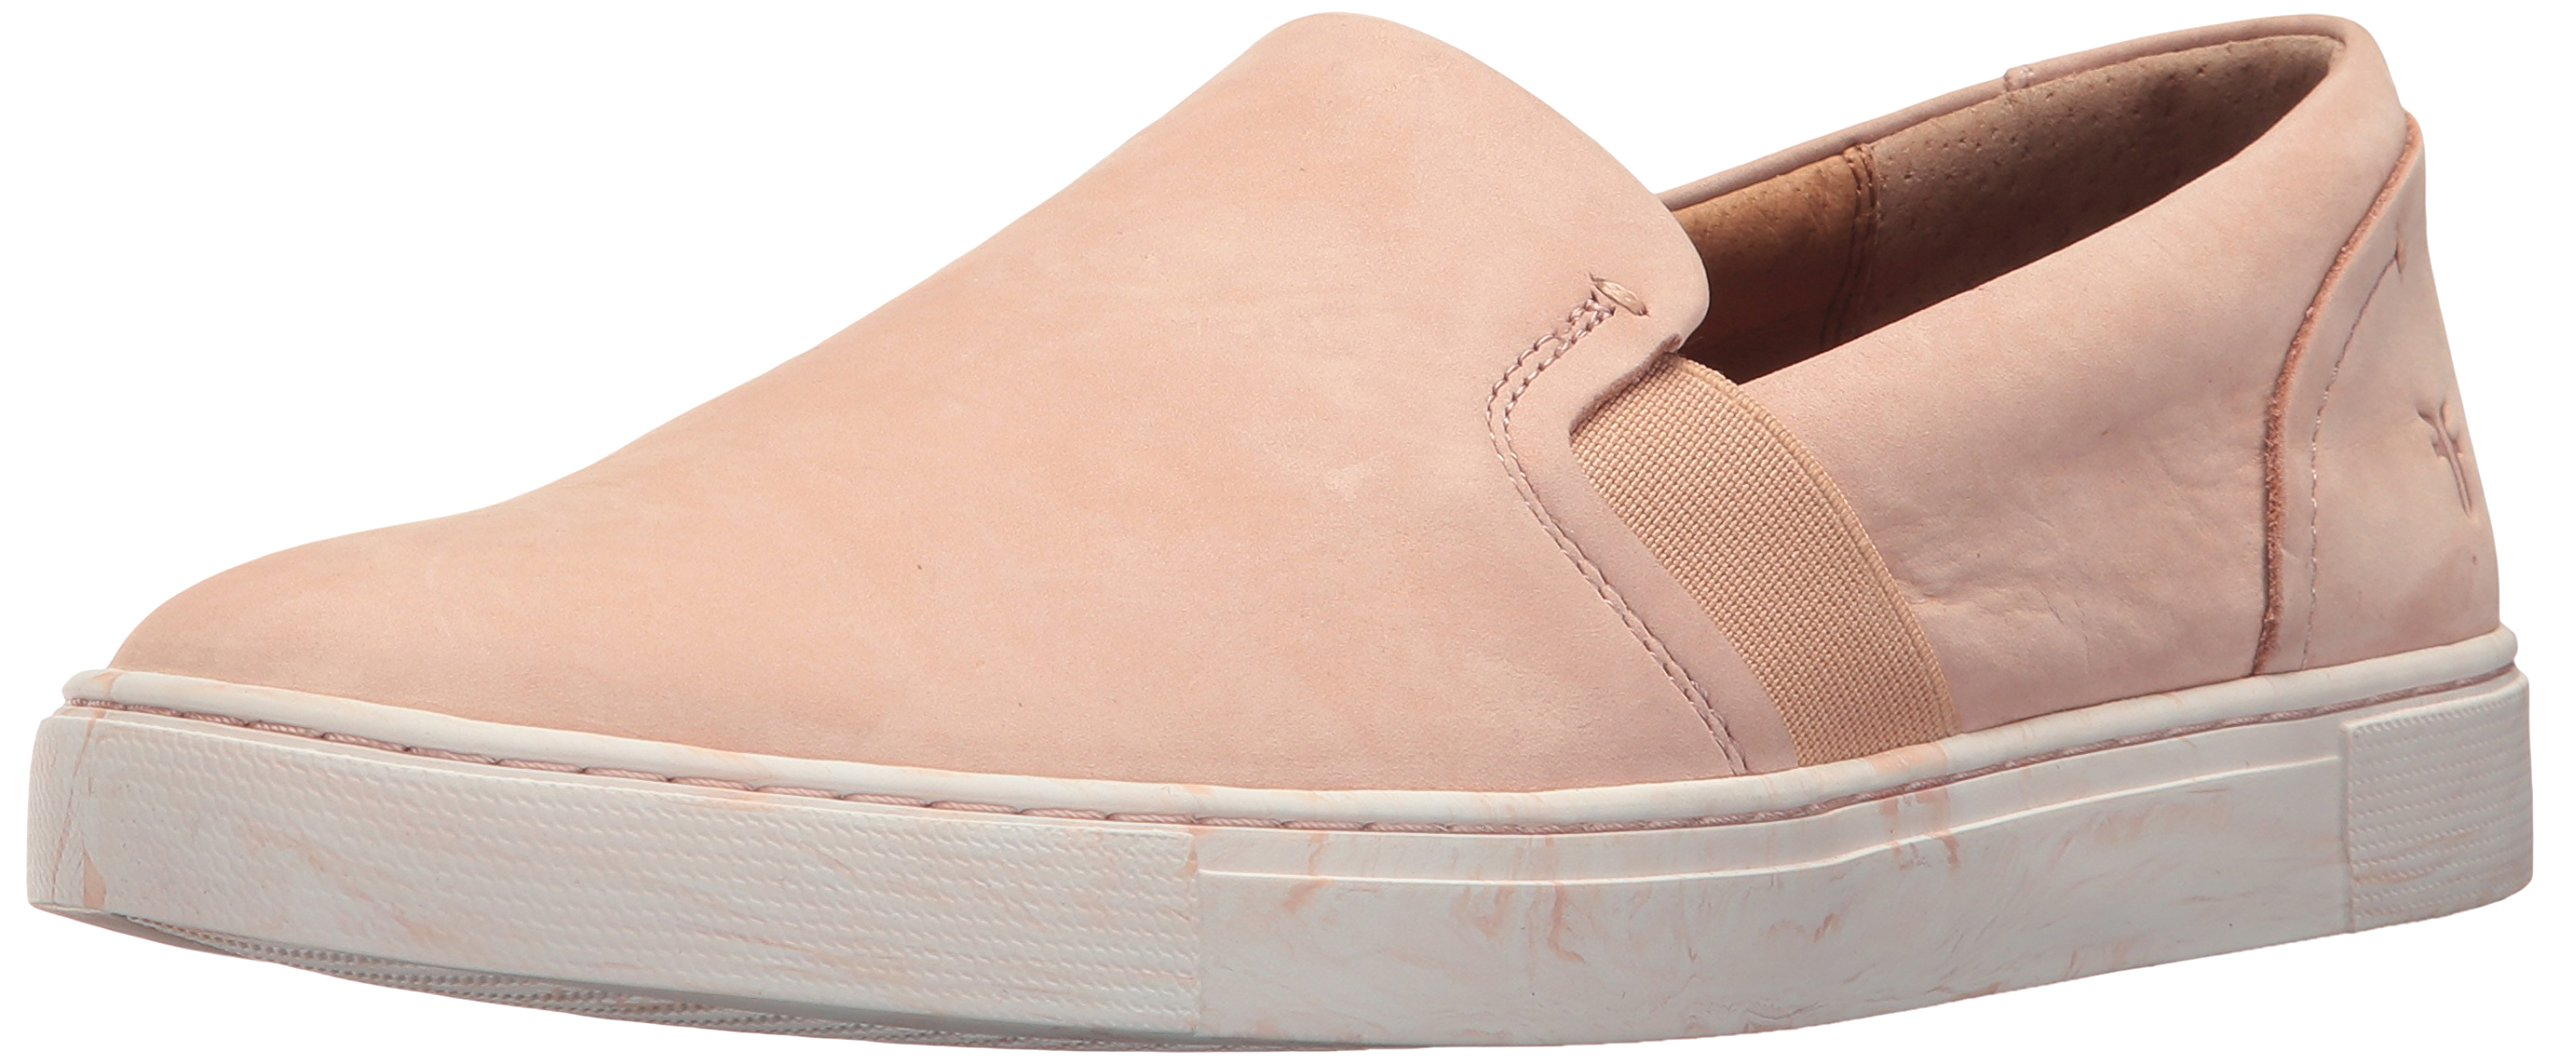 FRYE Women's IVY Slip Sneaker, Blush, 5.5 M US by FRYE (Image #1)